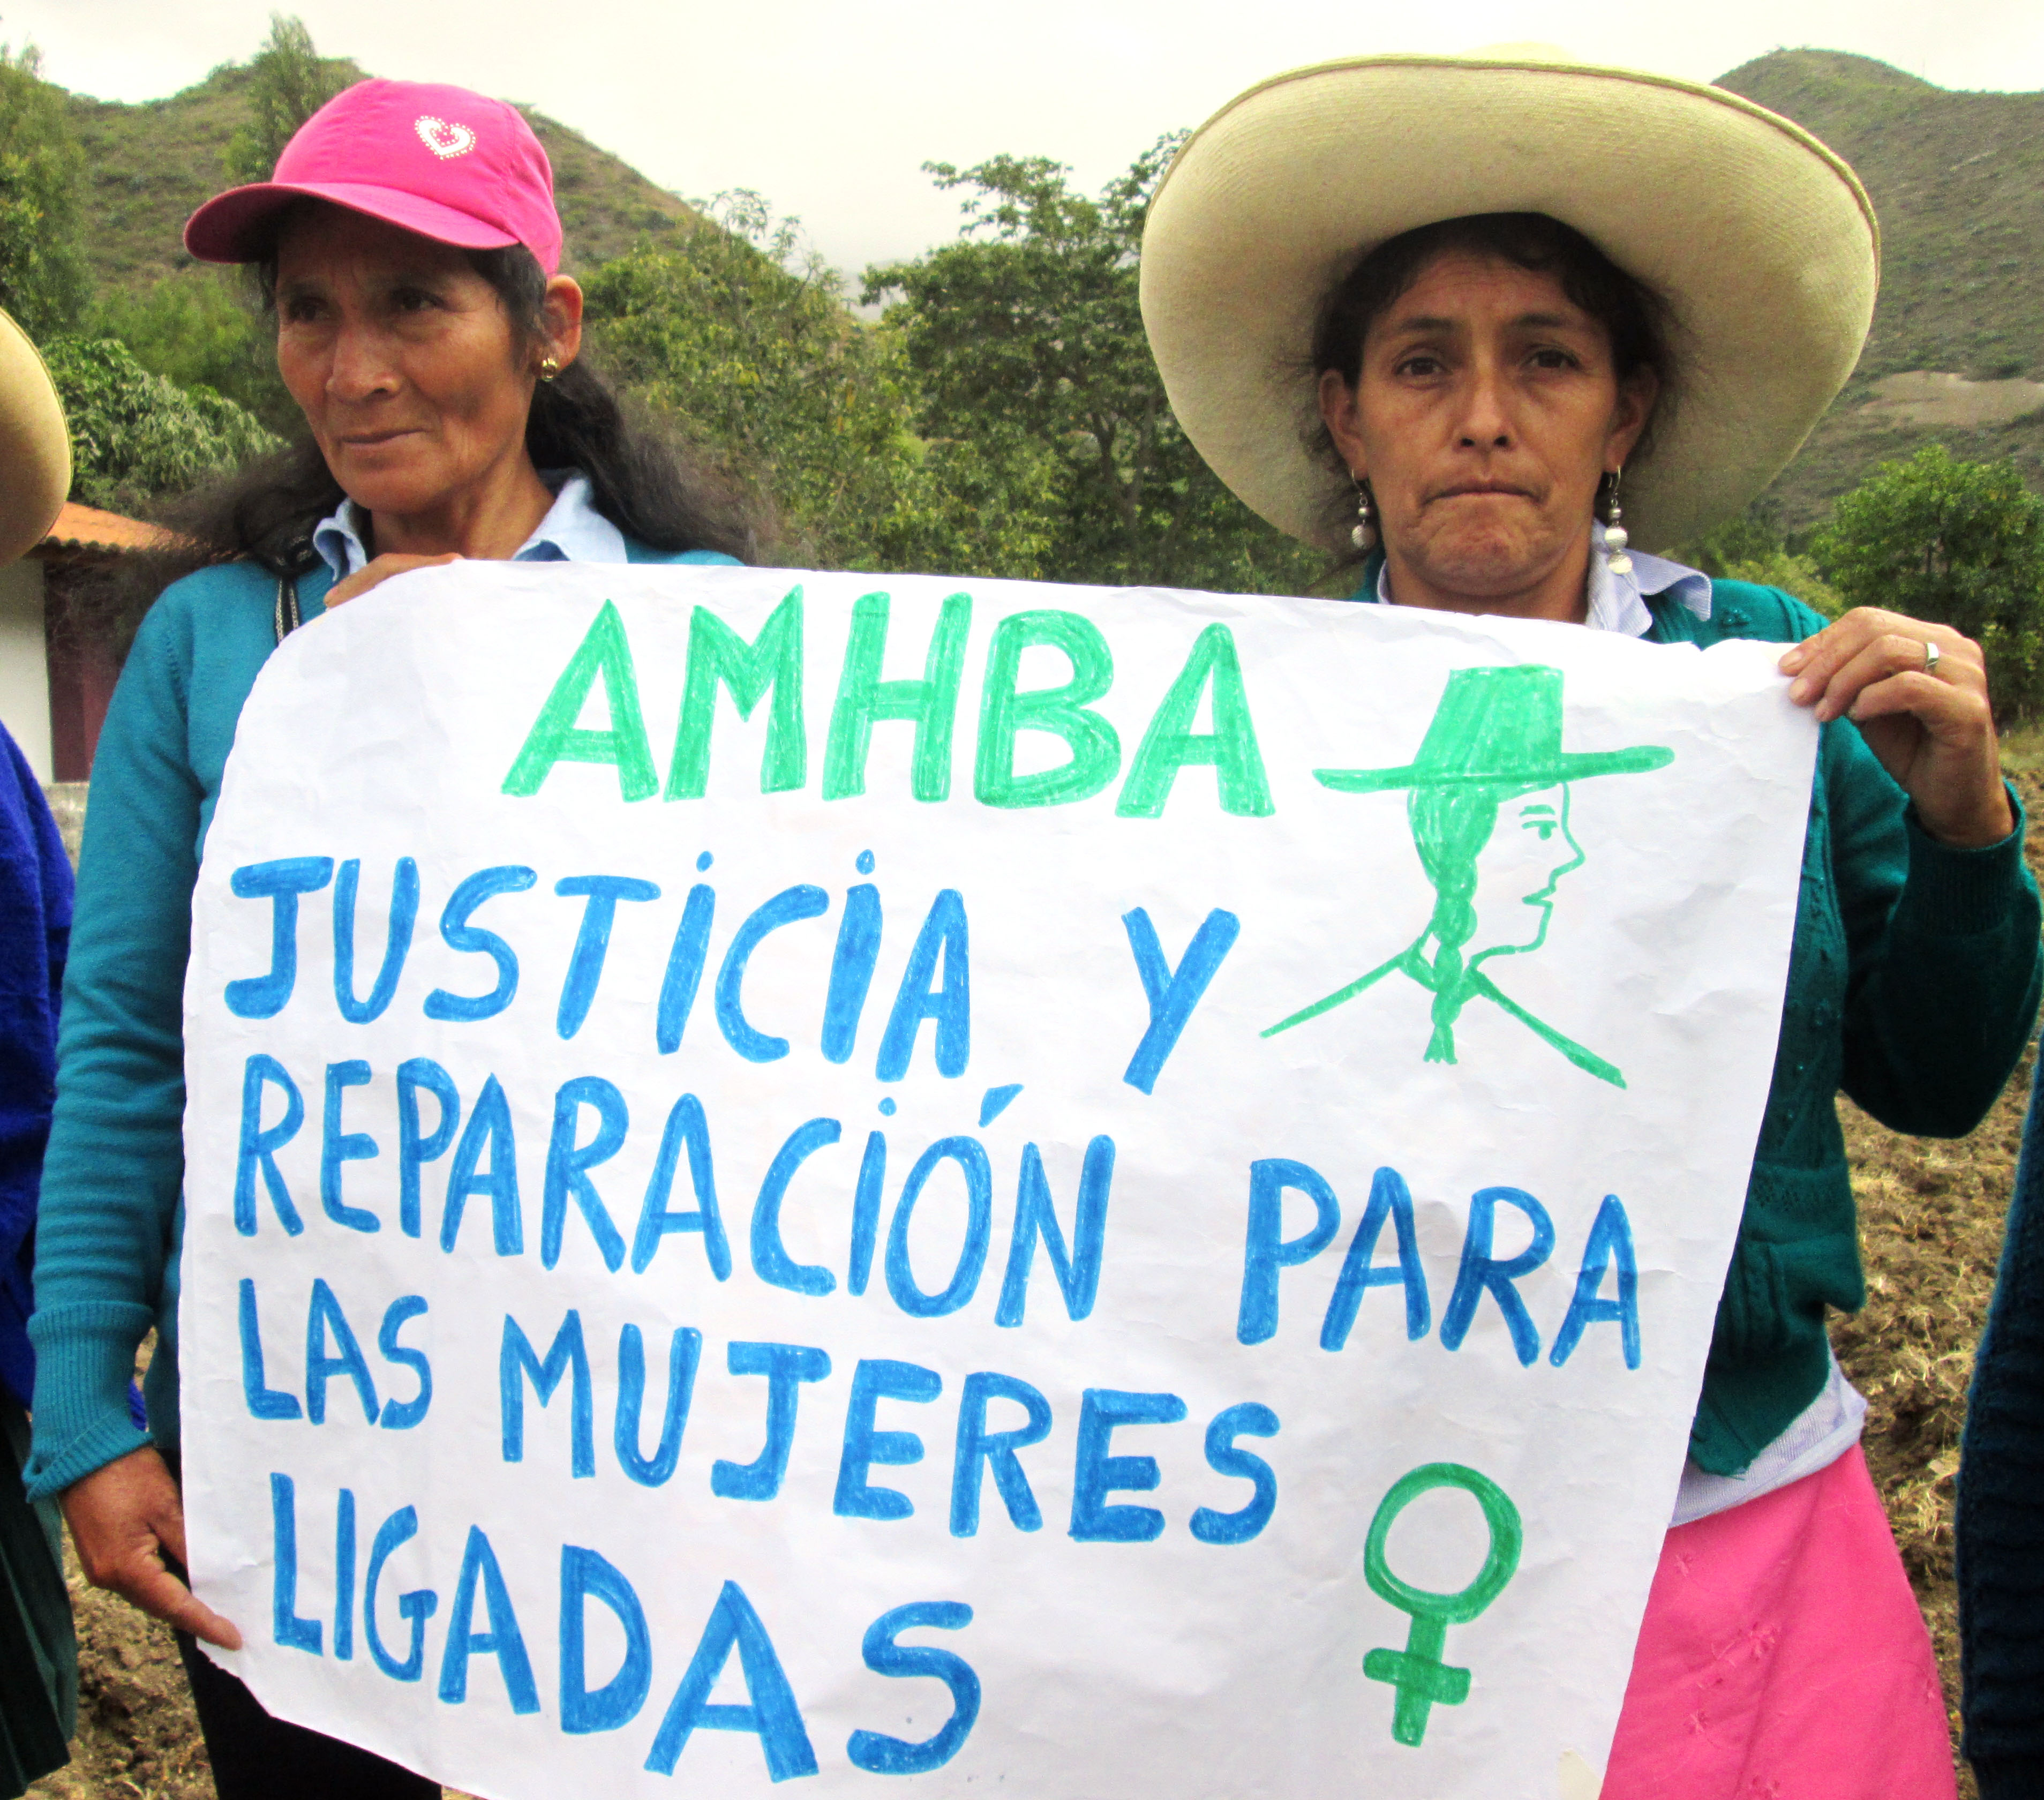 Foto: mujereslibresyenpaz.wordpress.com